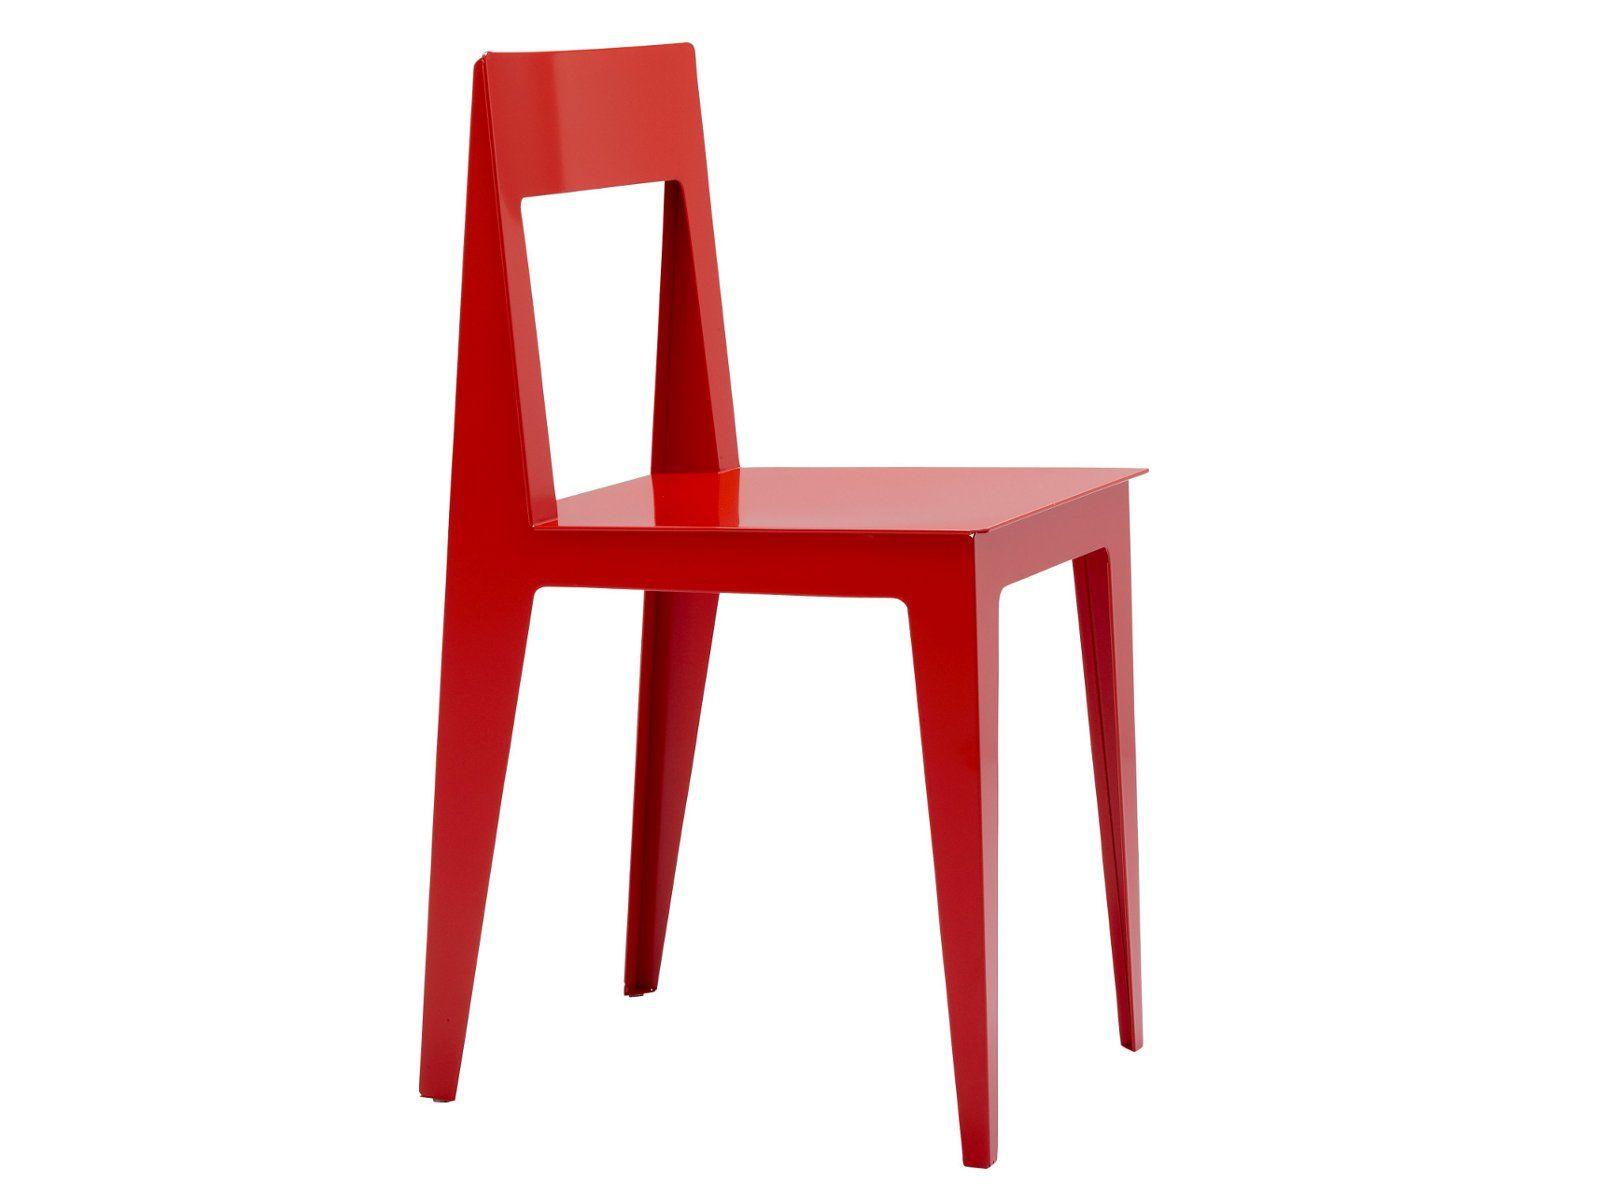 steel chair la pli e by ligne roset design marie aurore stiker m tral. Black Bedroom Furniture Sets. Home Design Ideas